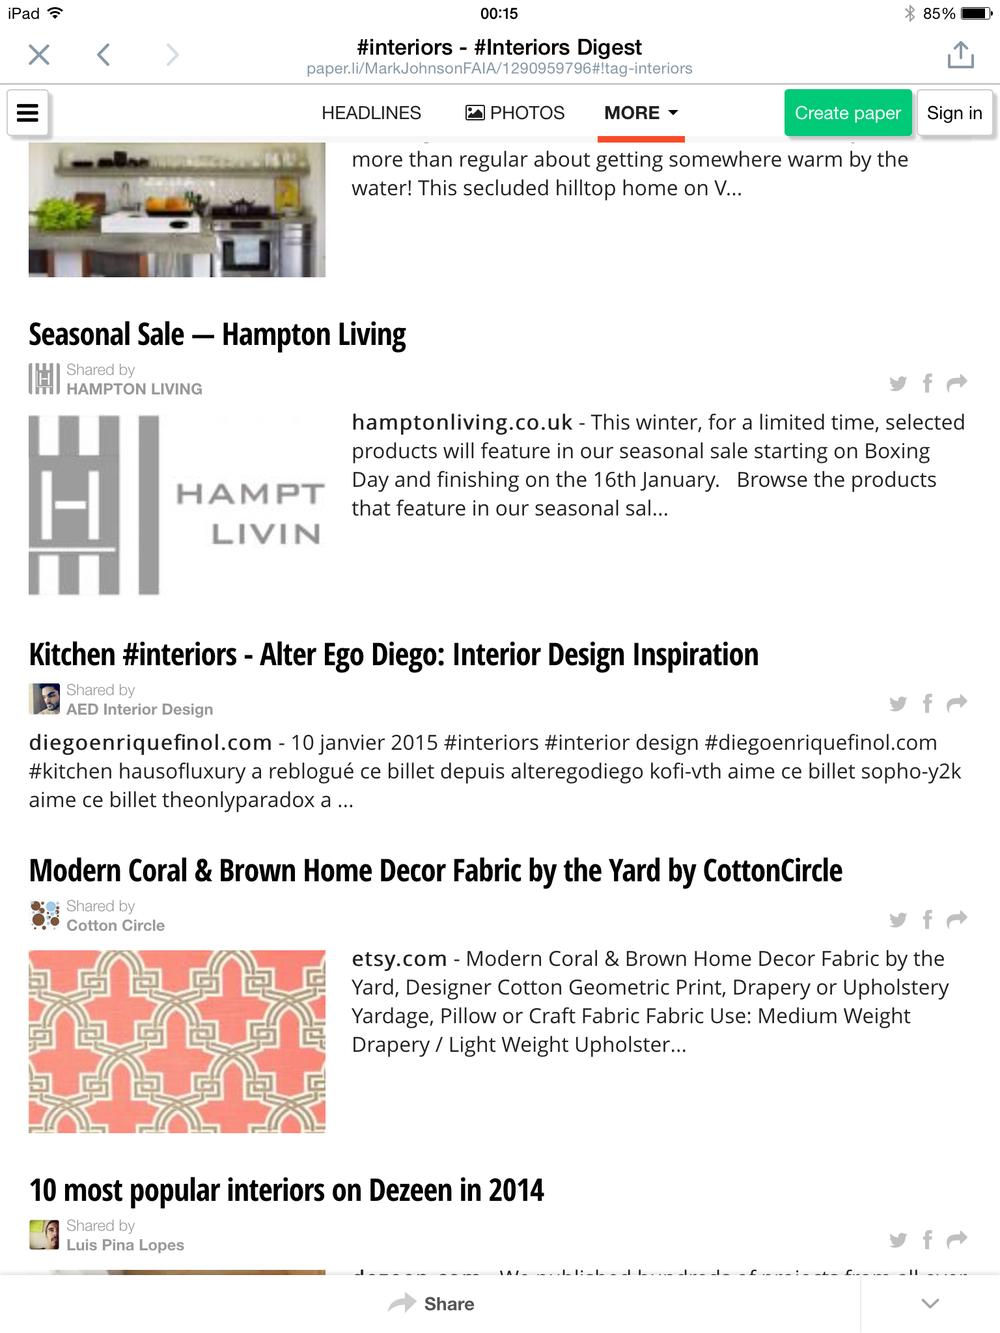 Interiors Deigest Online June 2015